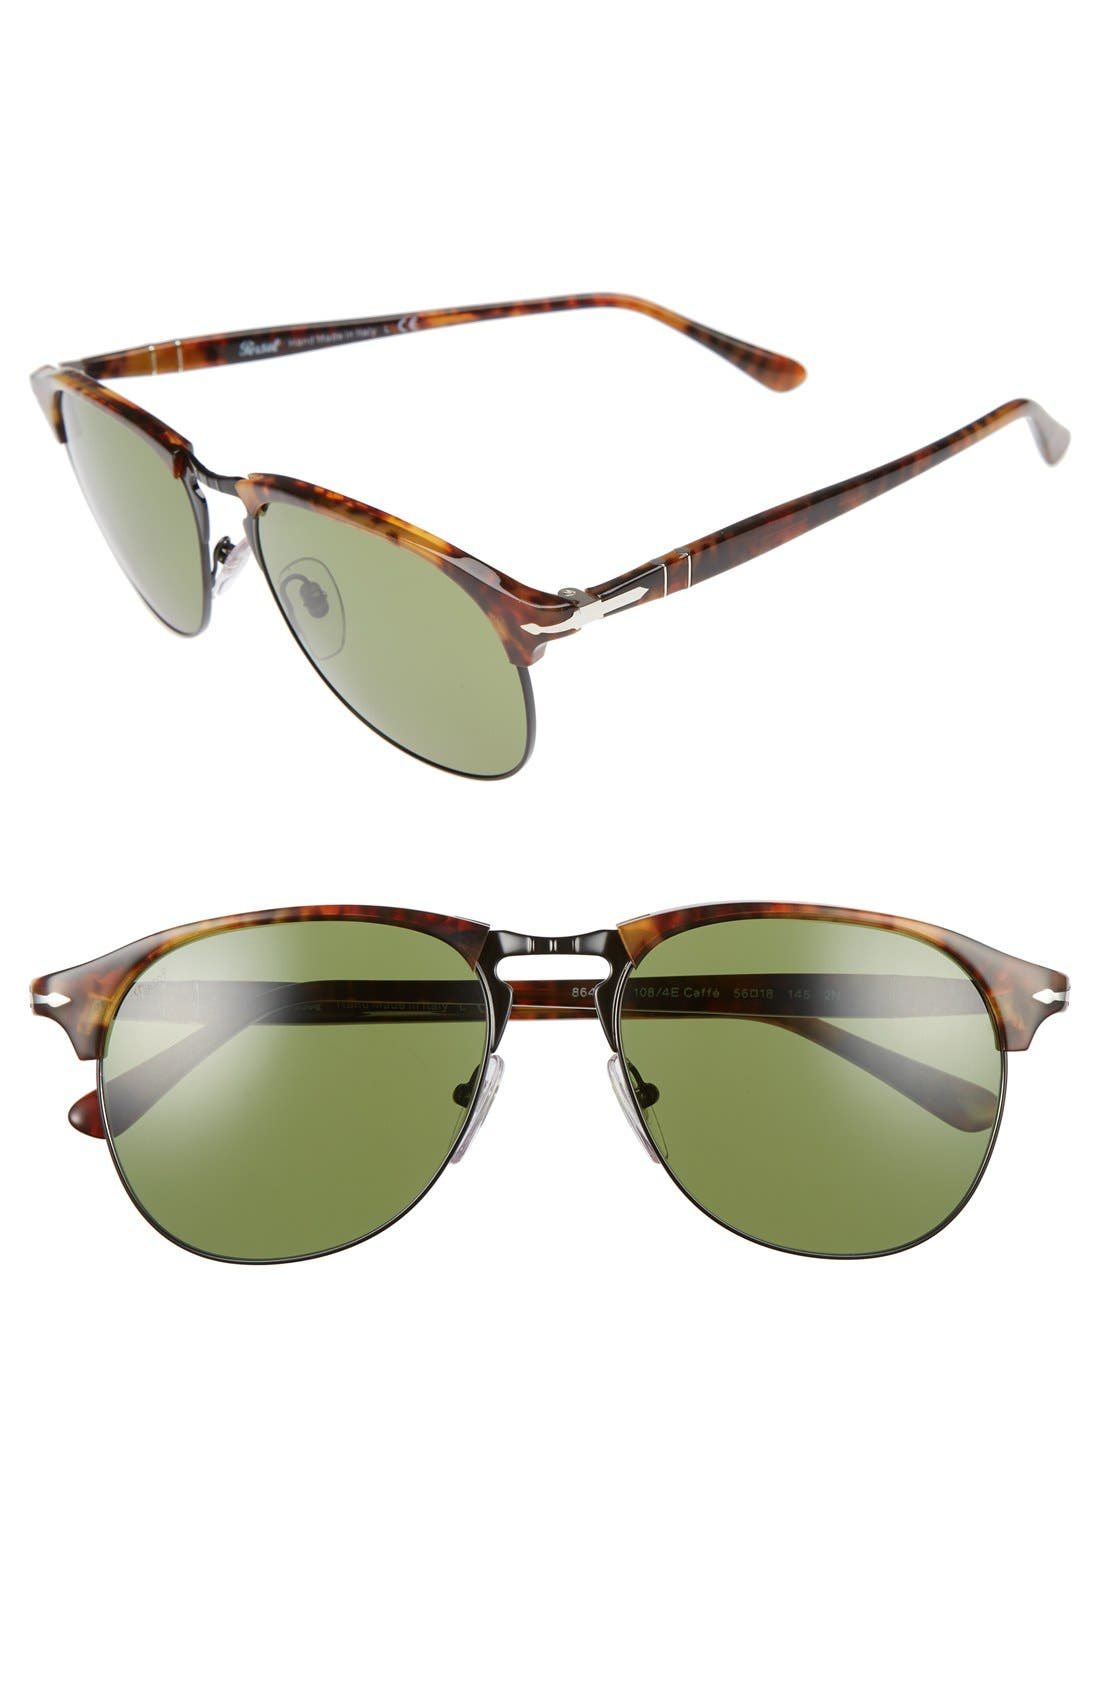 56mm Keyhole Sunglasses,                             Alternate thumbnail 2, color,                             DARK HAVANA